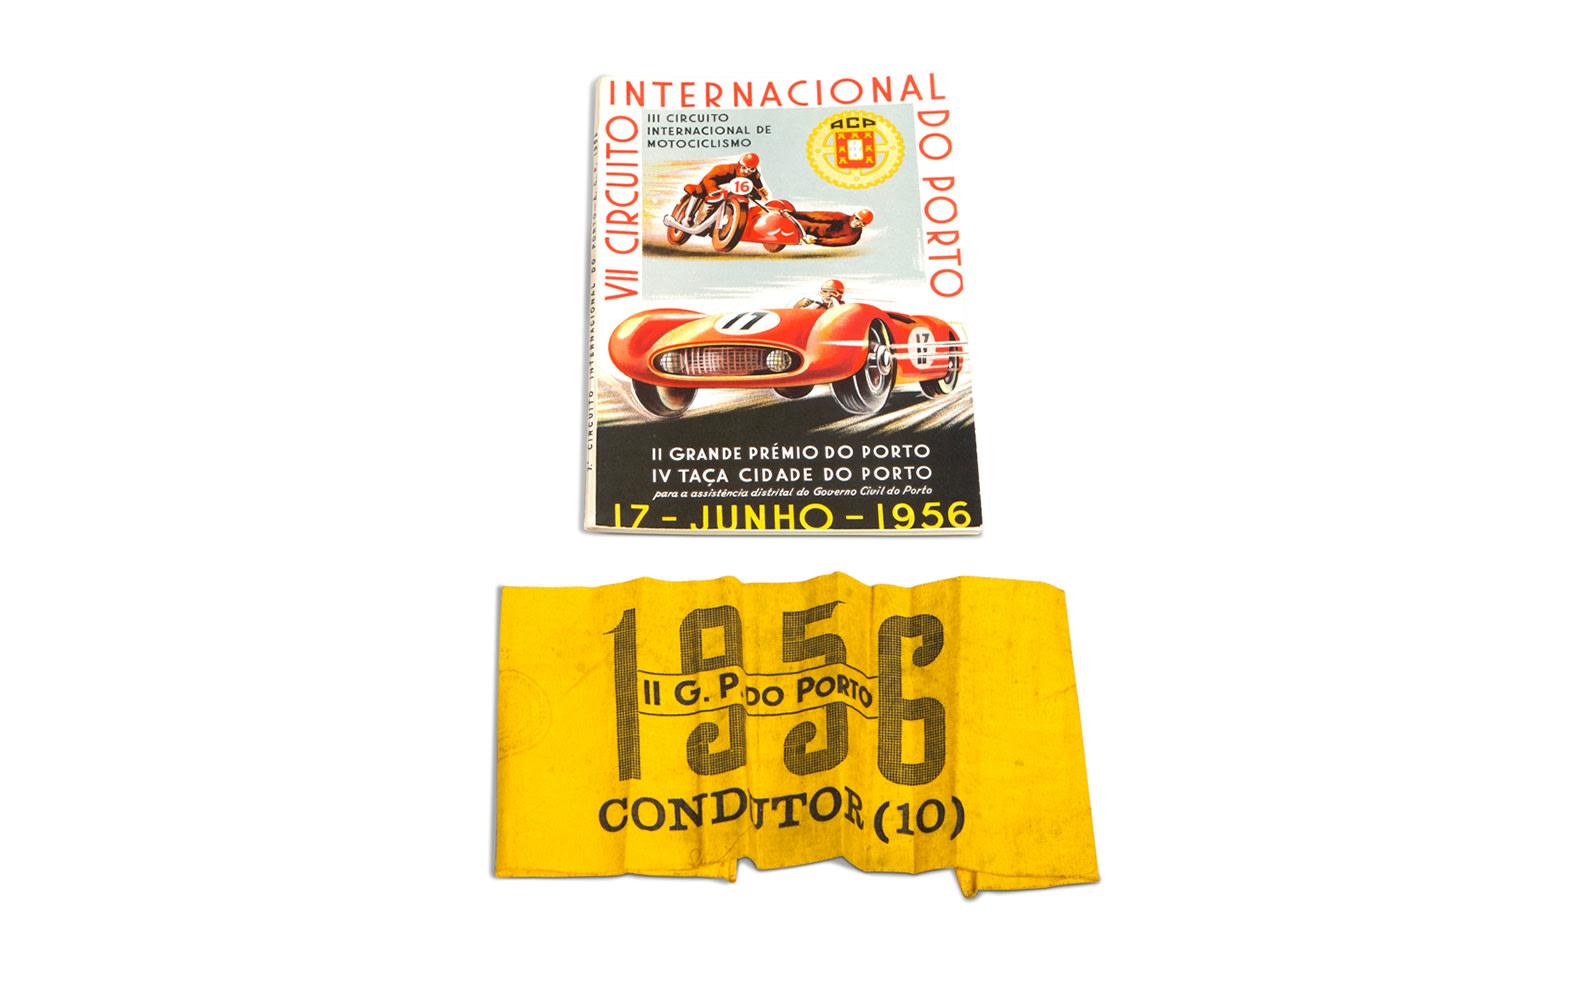 1956 Grand Prix of Porto Official Race Program and Driver Armband